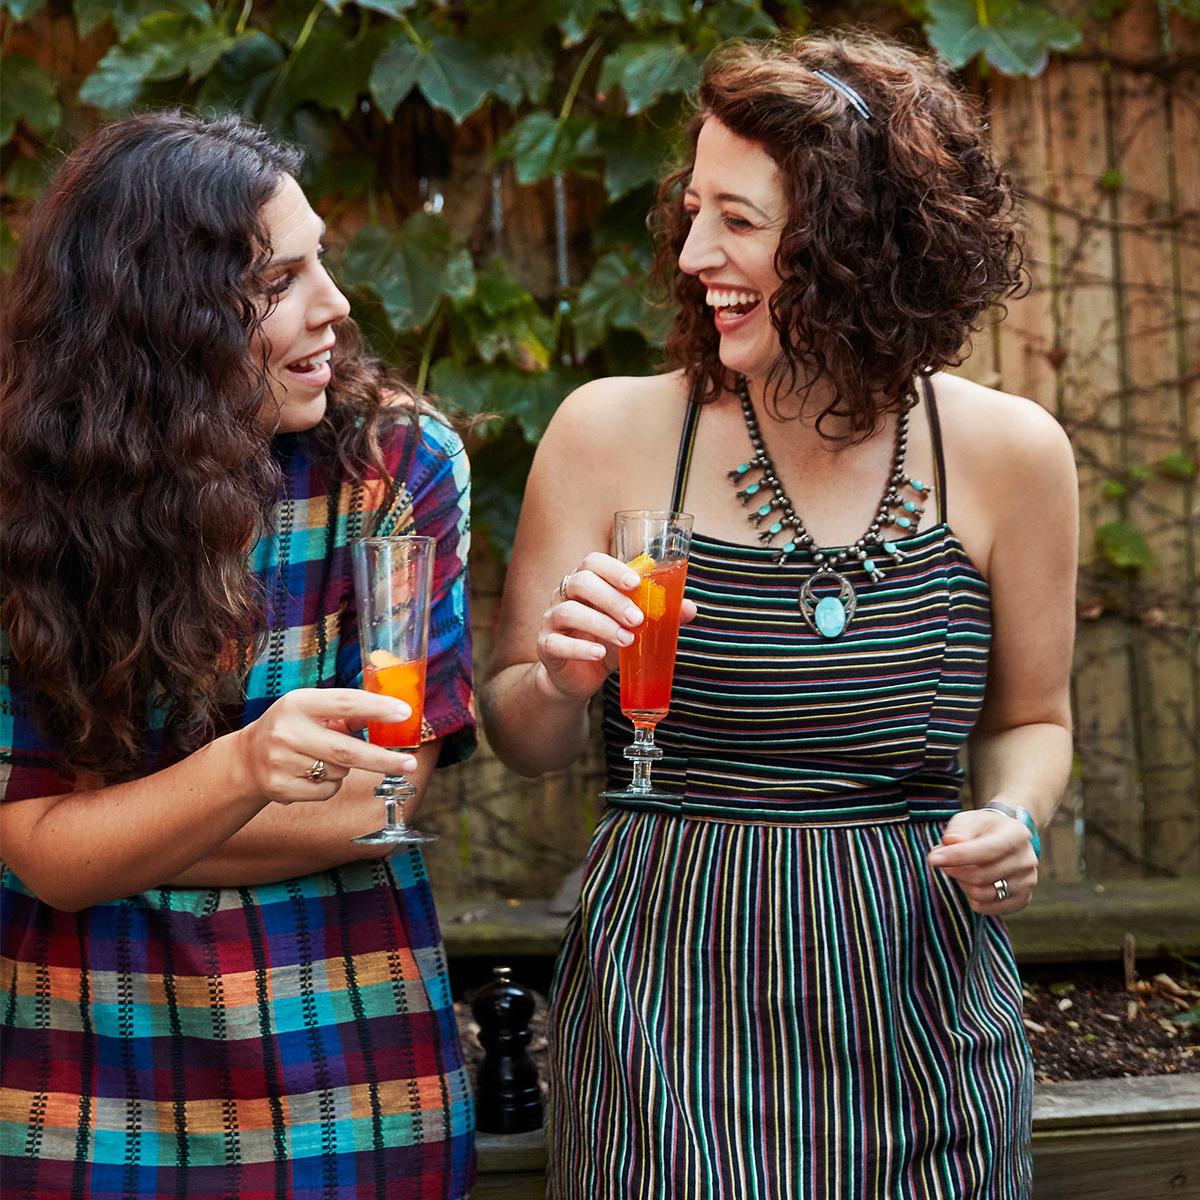 women-cocktails-summer-party-27b9c49e.jpg